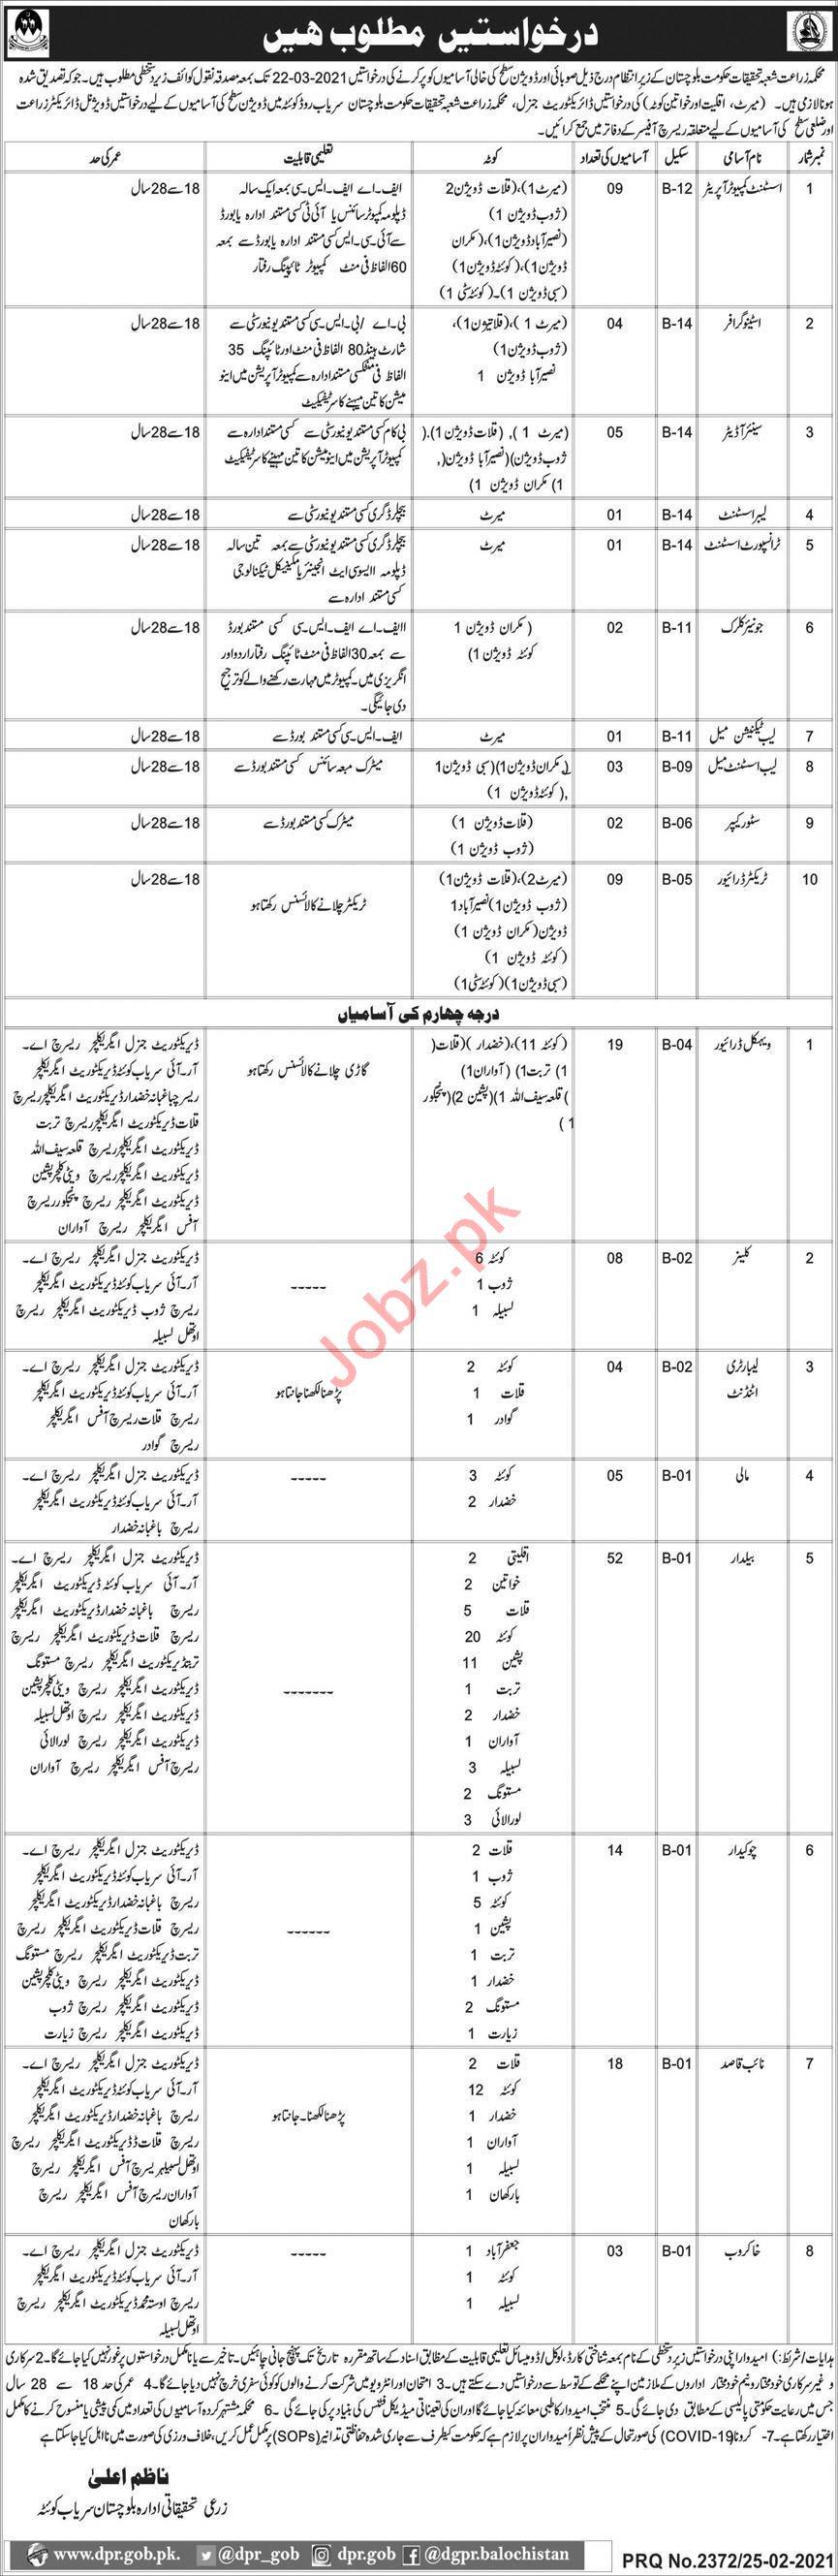 Agriculture Extension Department Balochistan Jobs 2021